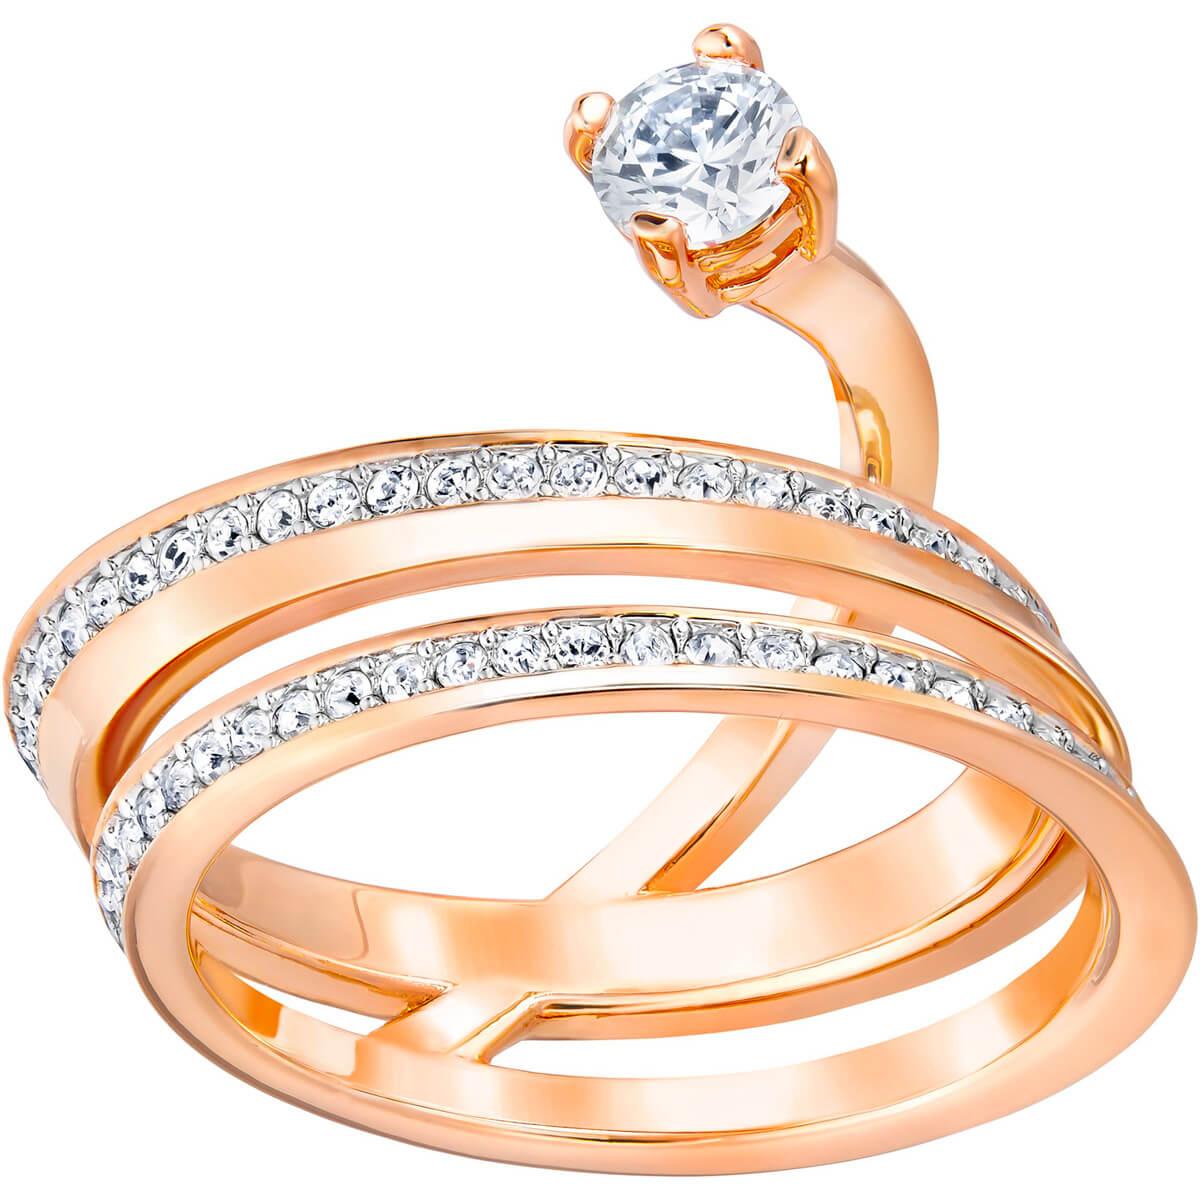 Swarvoski Fresh Ring Rose Gold Plating - SIZE 55  -  £23.95 @ Swarovski online